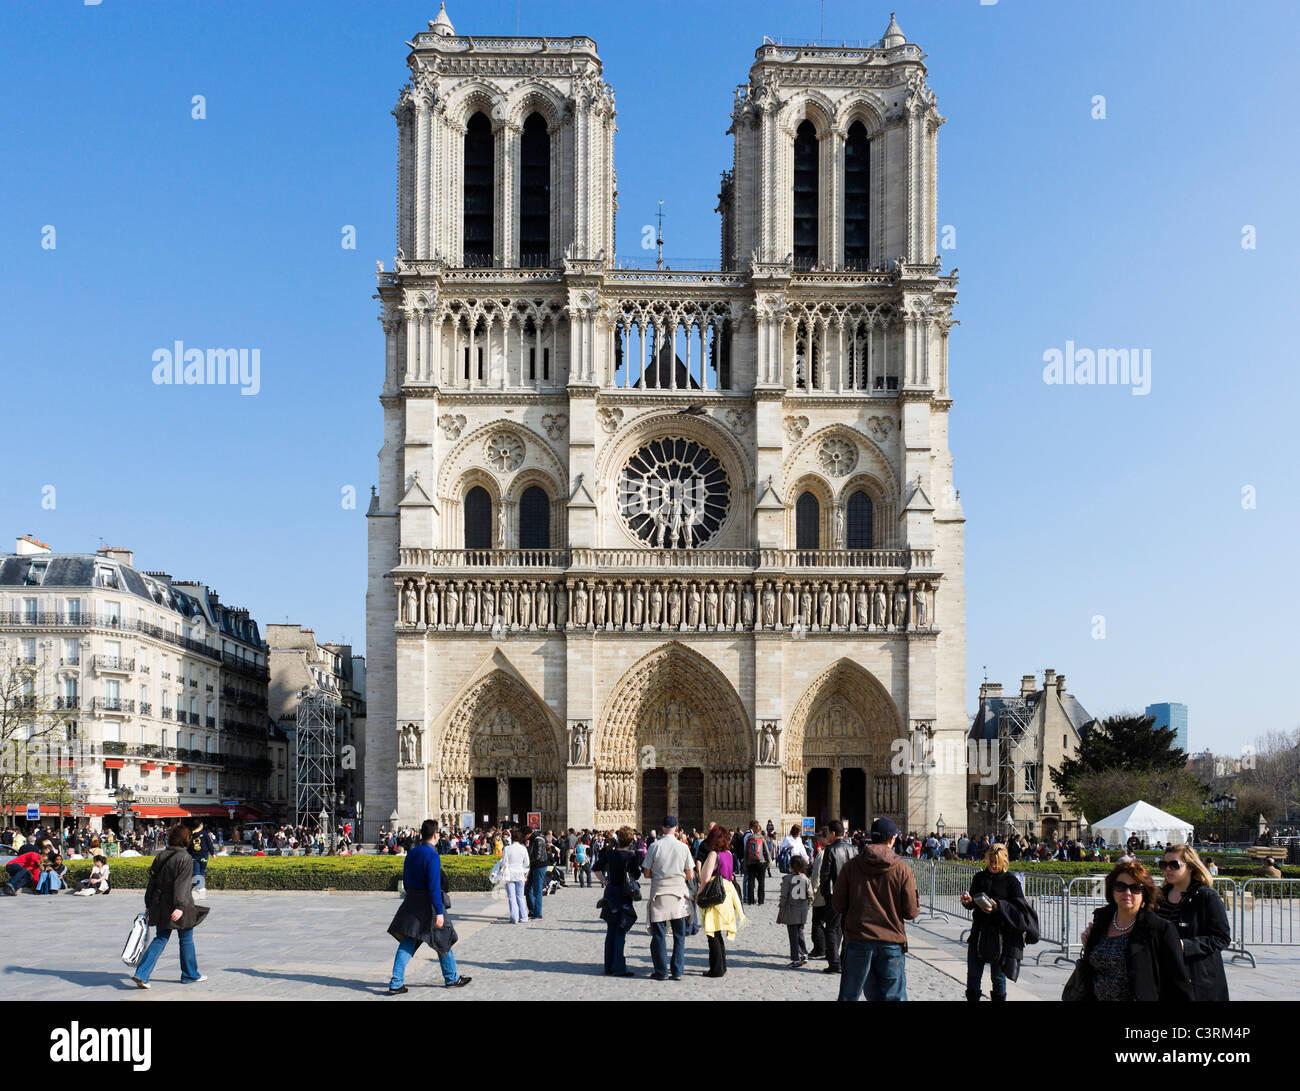 La fachada occidental de la catedral de Notre Dame de París, Ile de la Cité, París, Francia Imagen De Stock